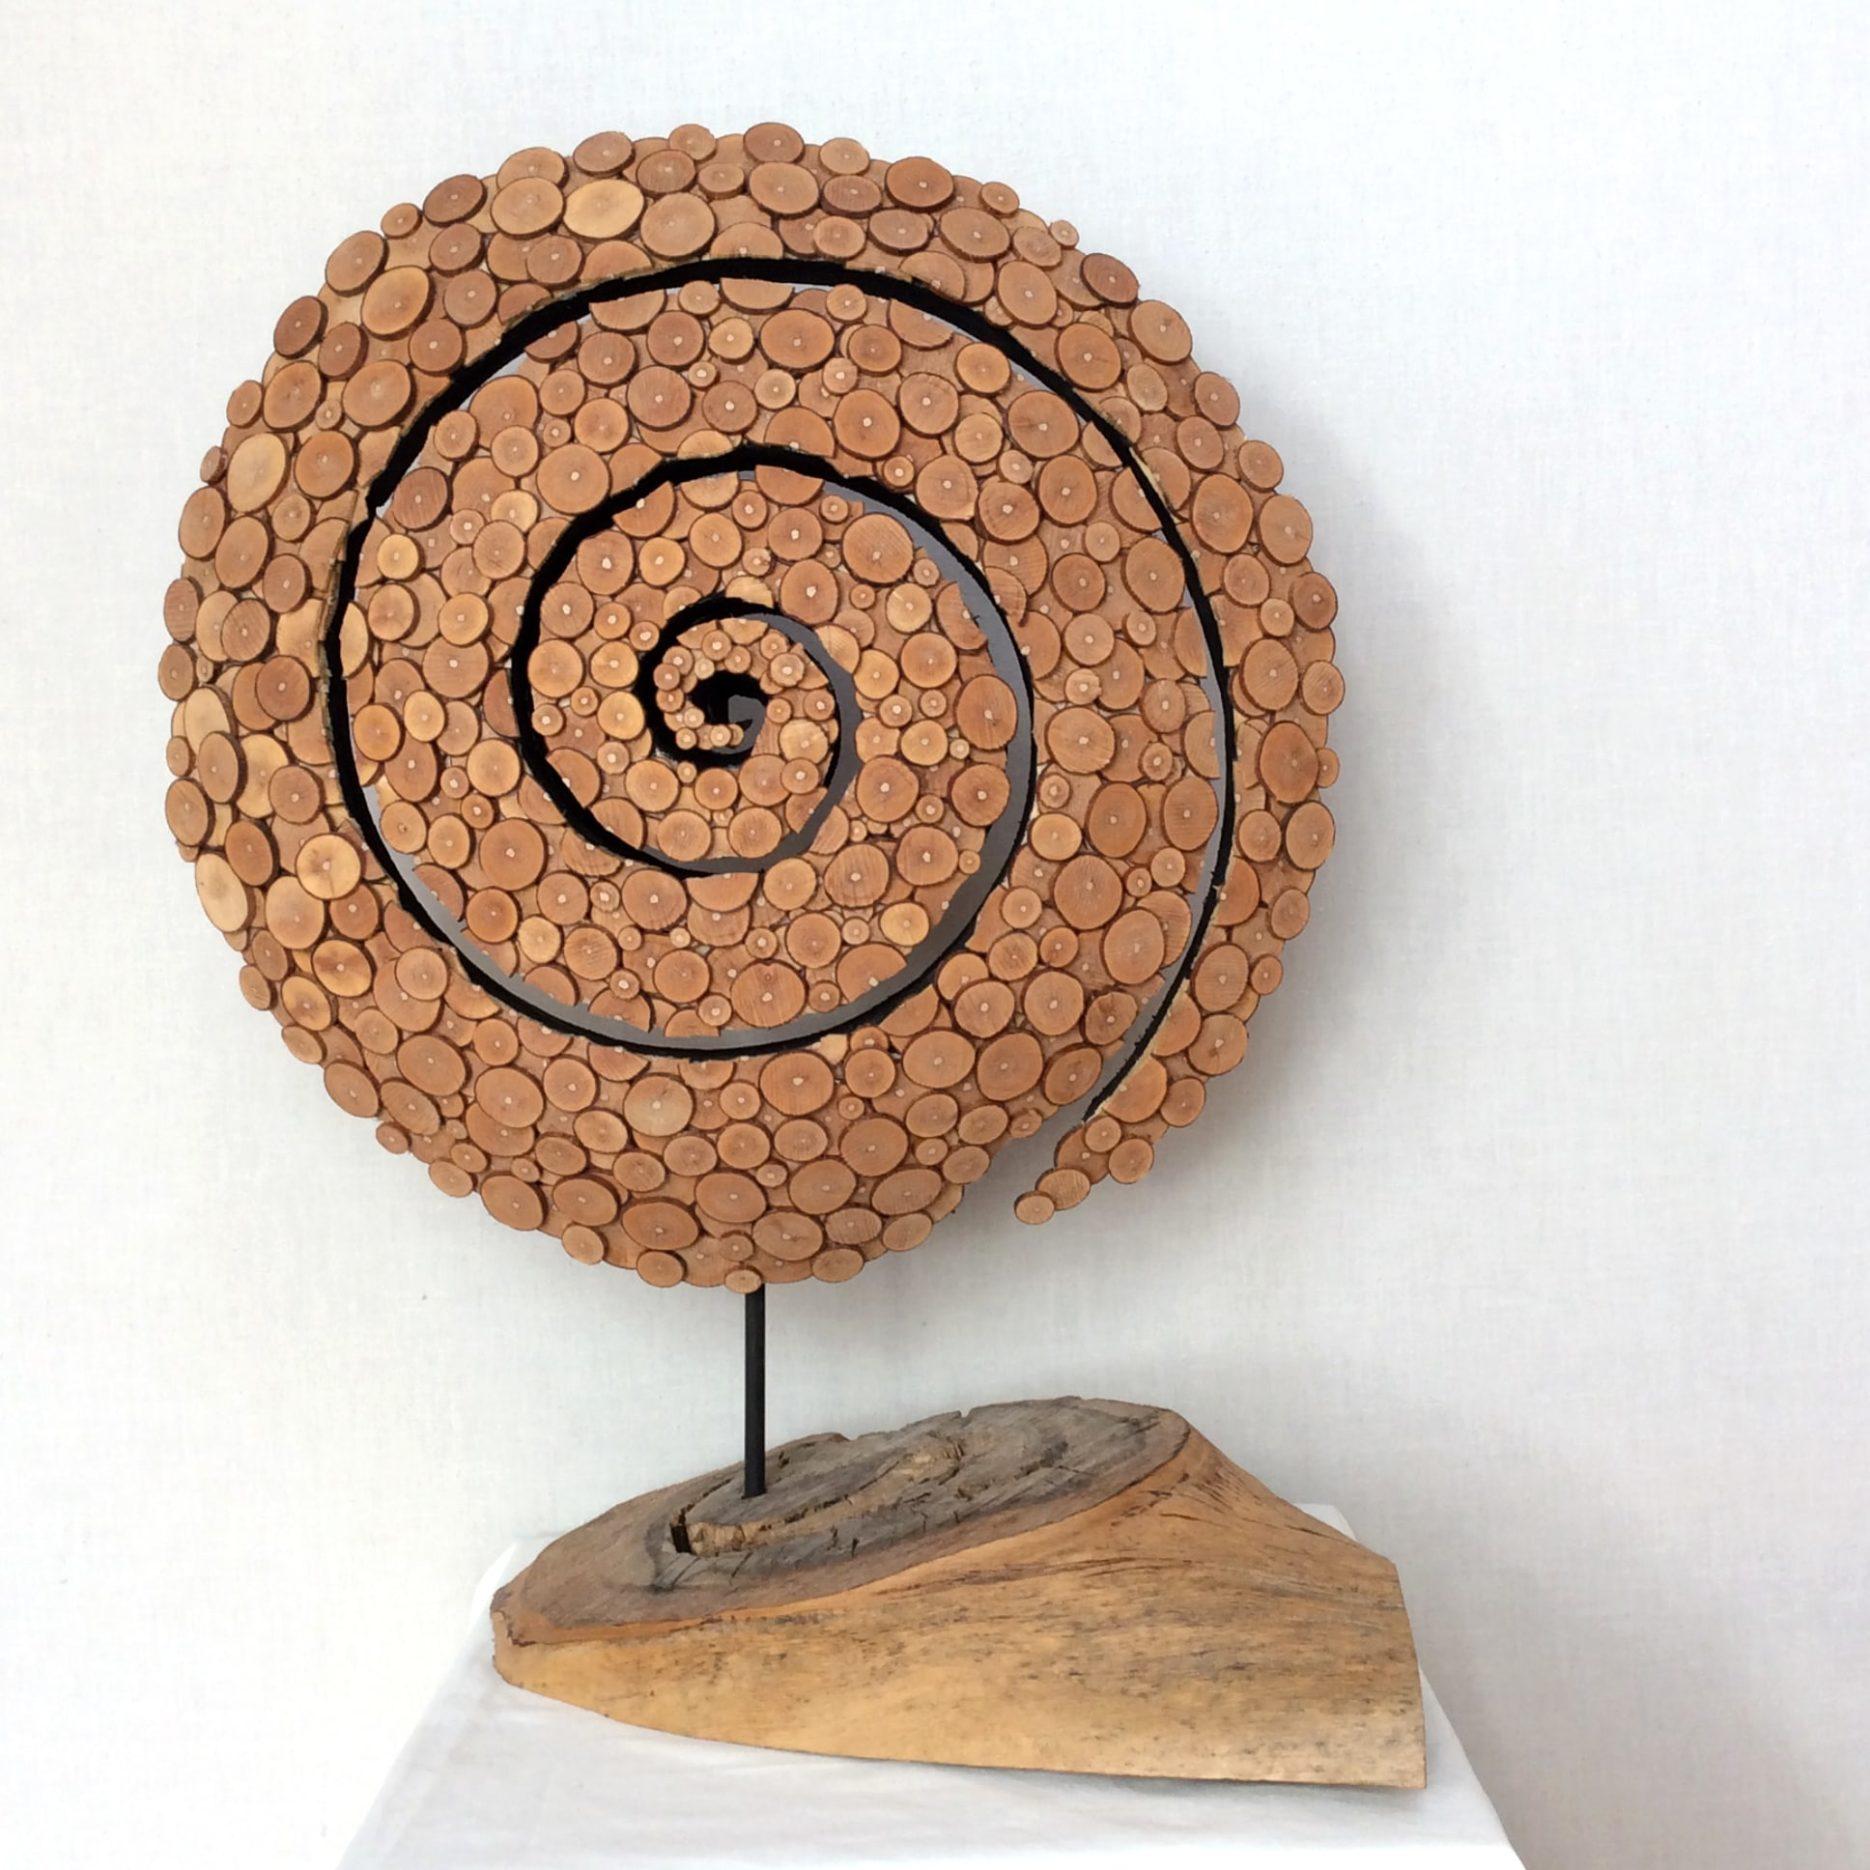 Objekt 0,57 x 0,45 m Holzscheibenspirale (2019)